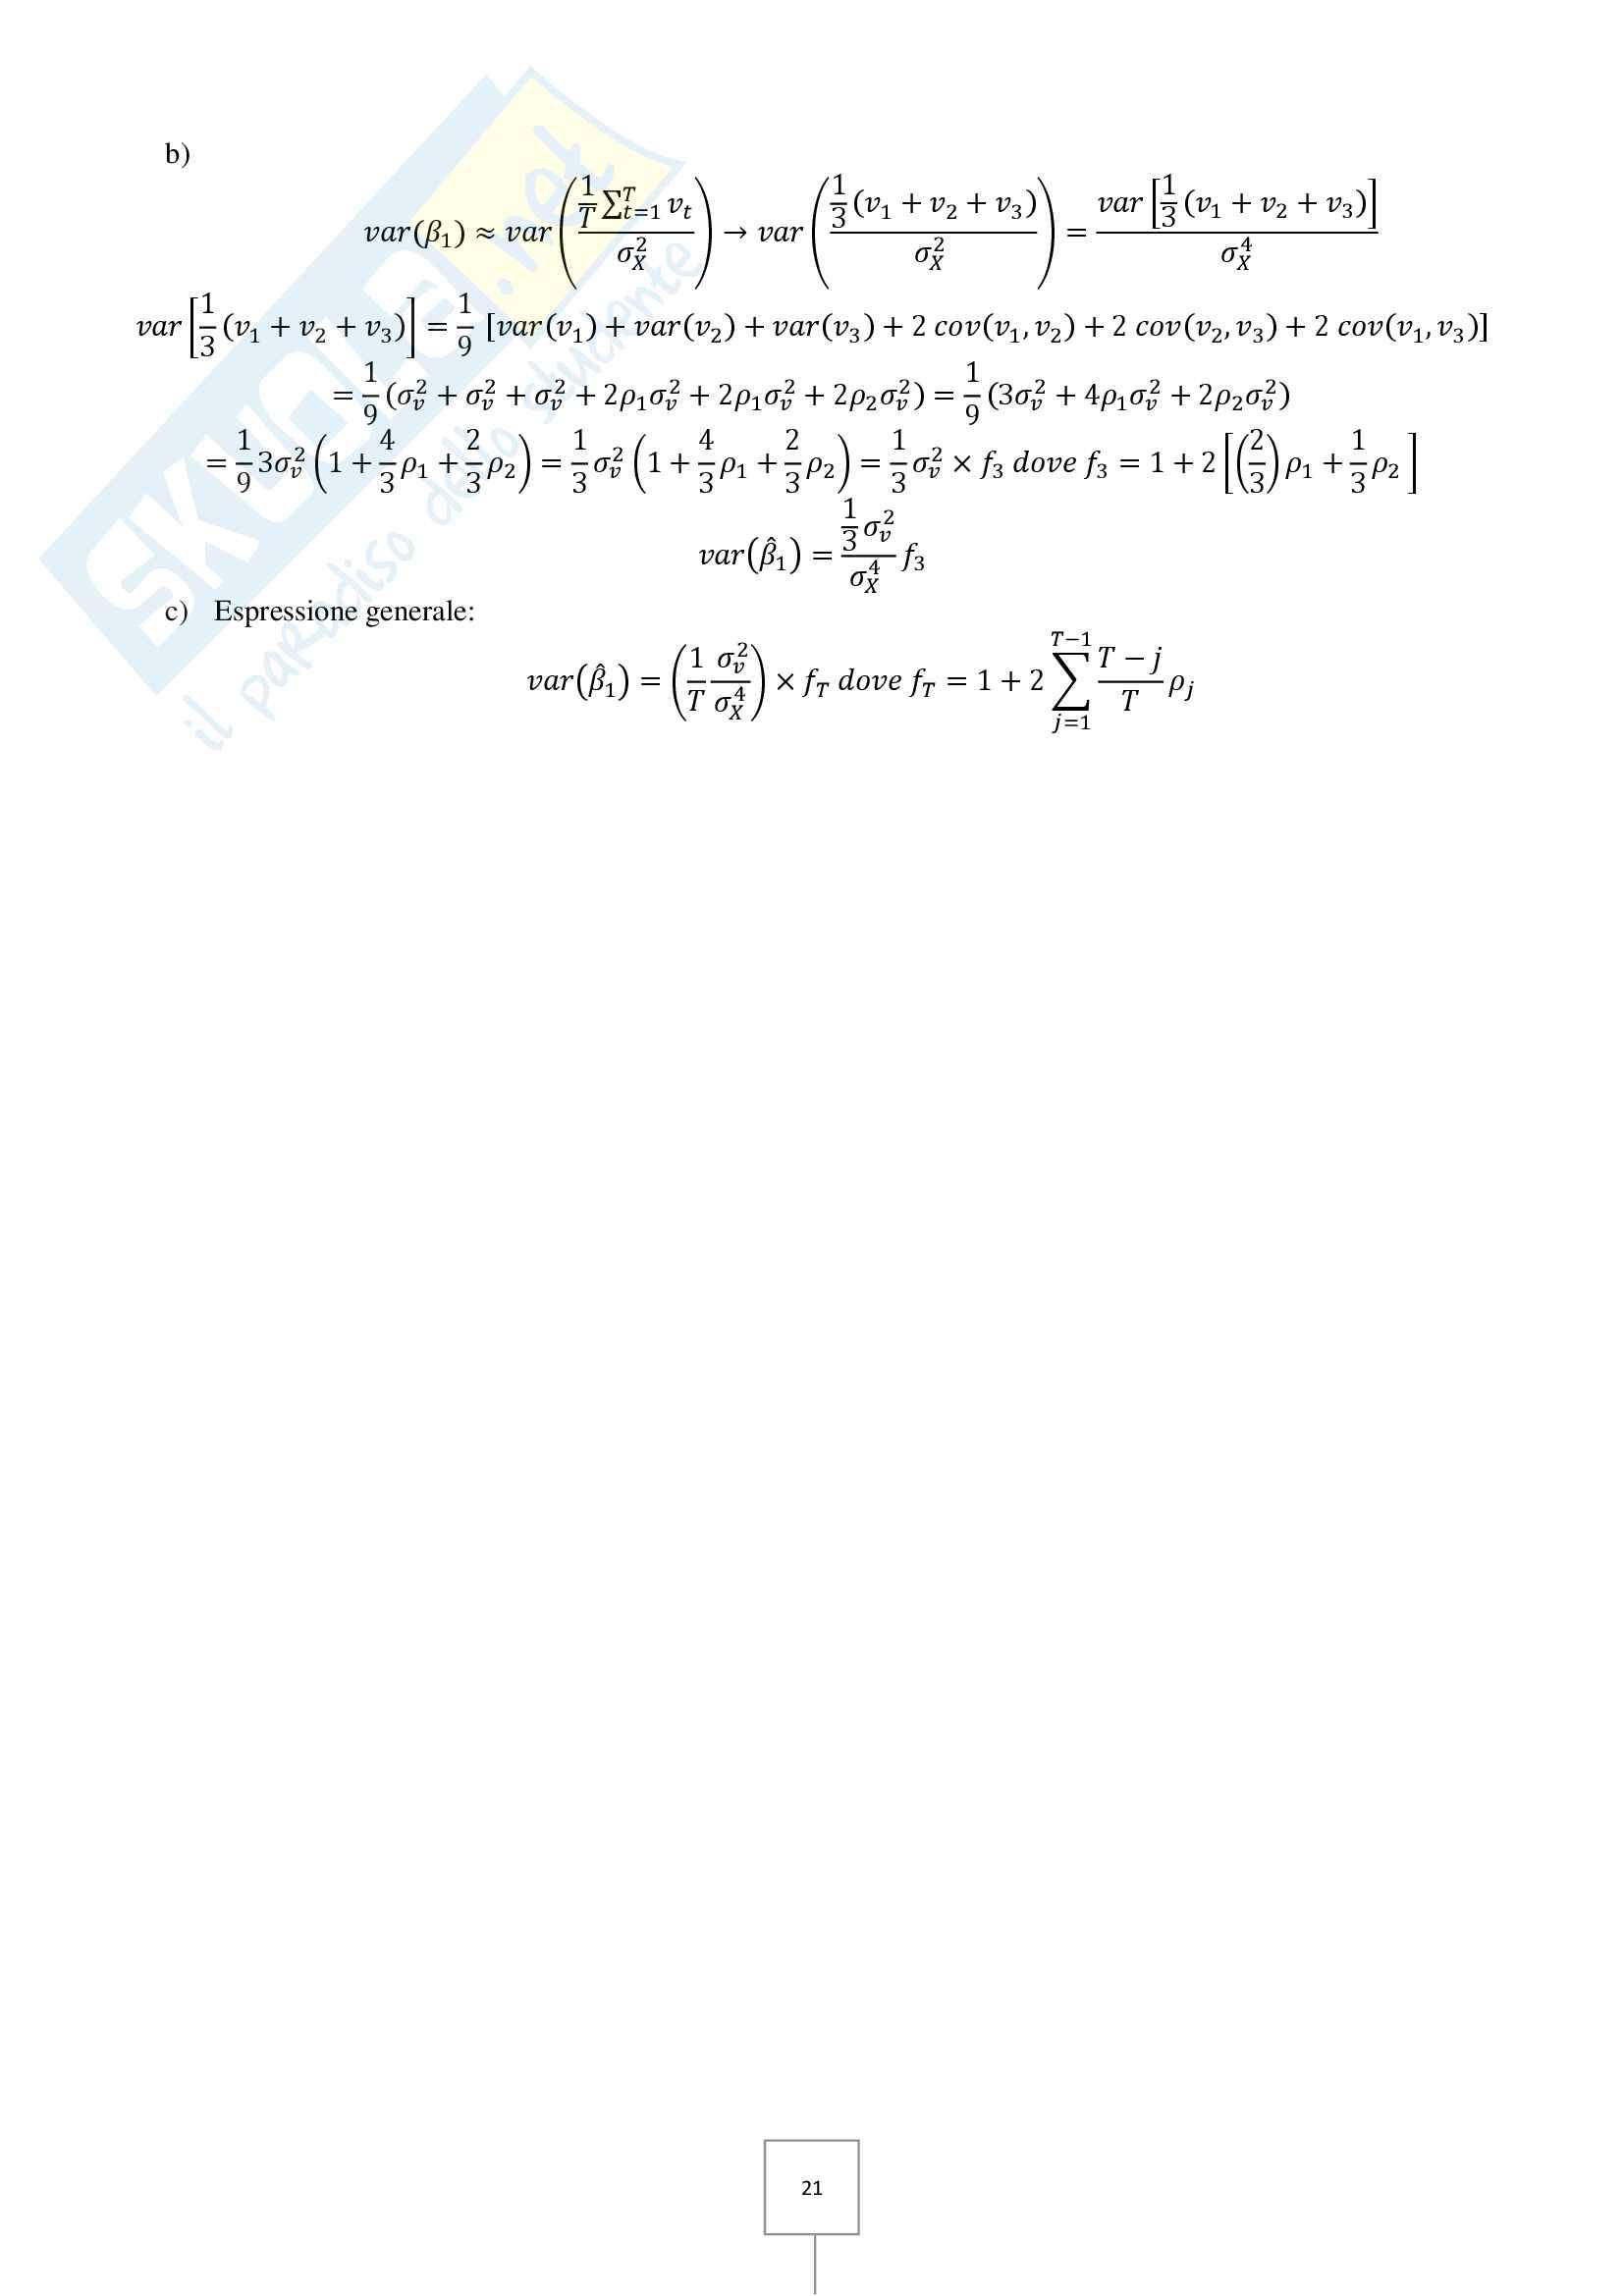 Econometria - Prove d'esame risolte Pag. 21